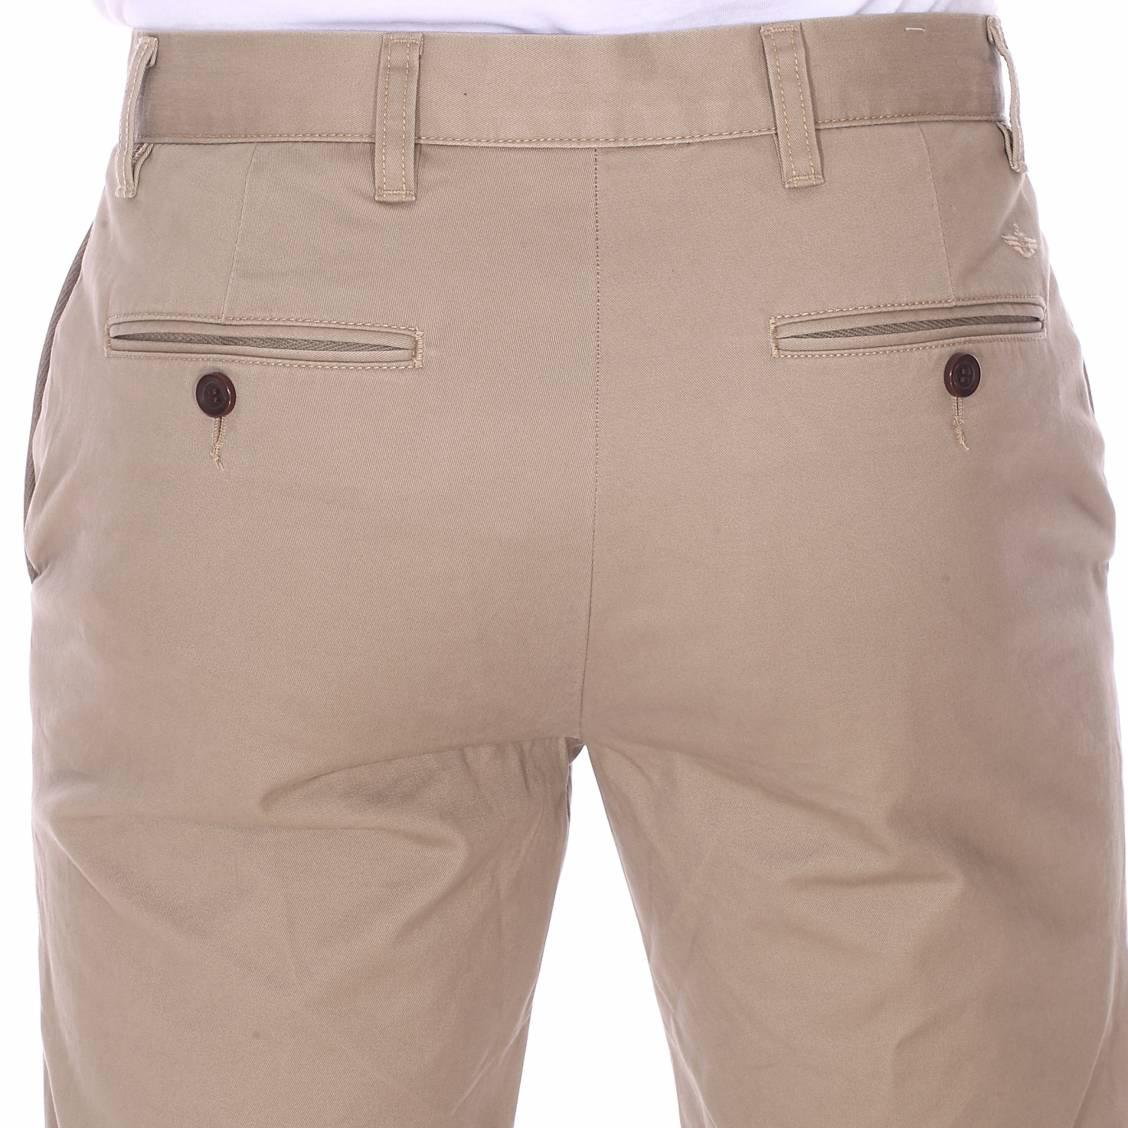 Pantalon chino Marina Dockers beige foncé